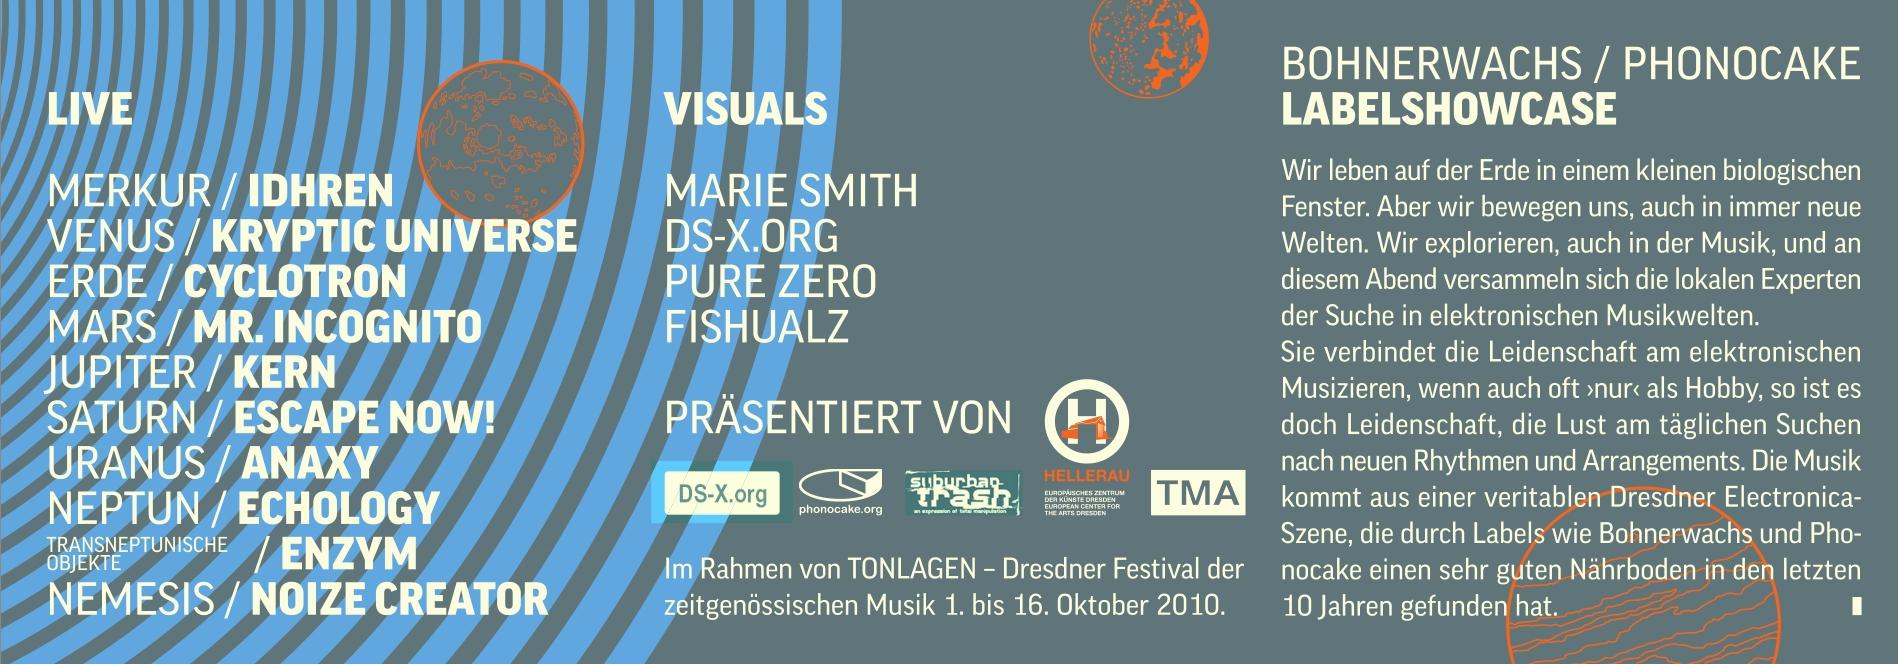 2010 08 11 tonlagen label showcase 2 Back-web